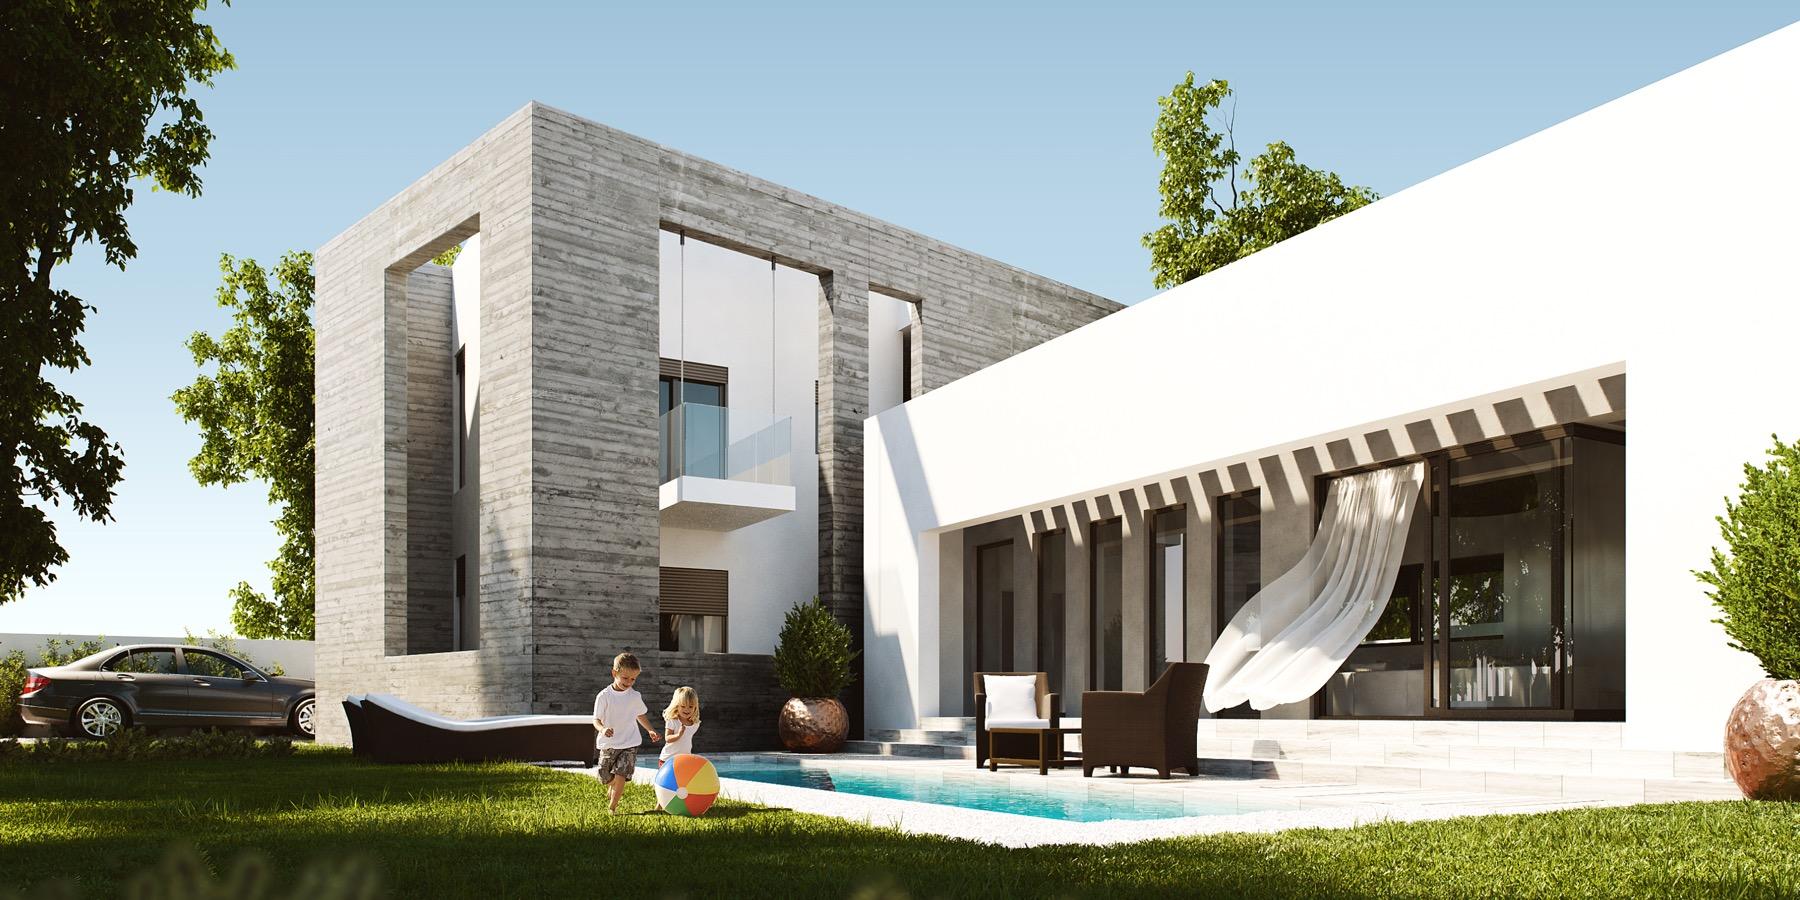 Ronda arquitectos m laga especialidad viviendas - Arquitectos interioristas malaga ...